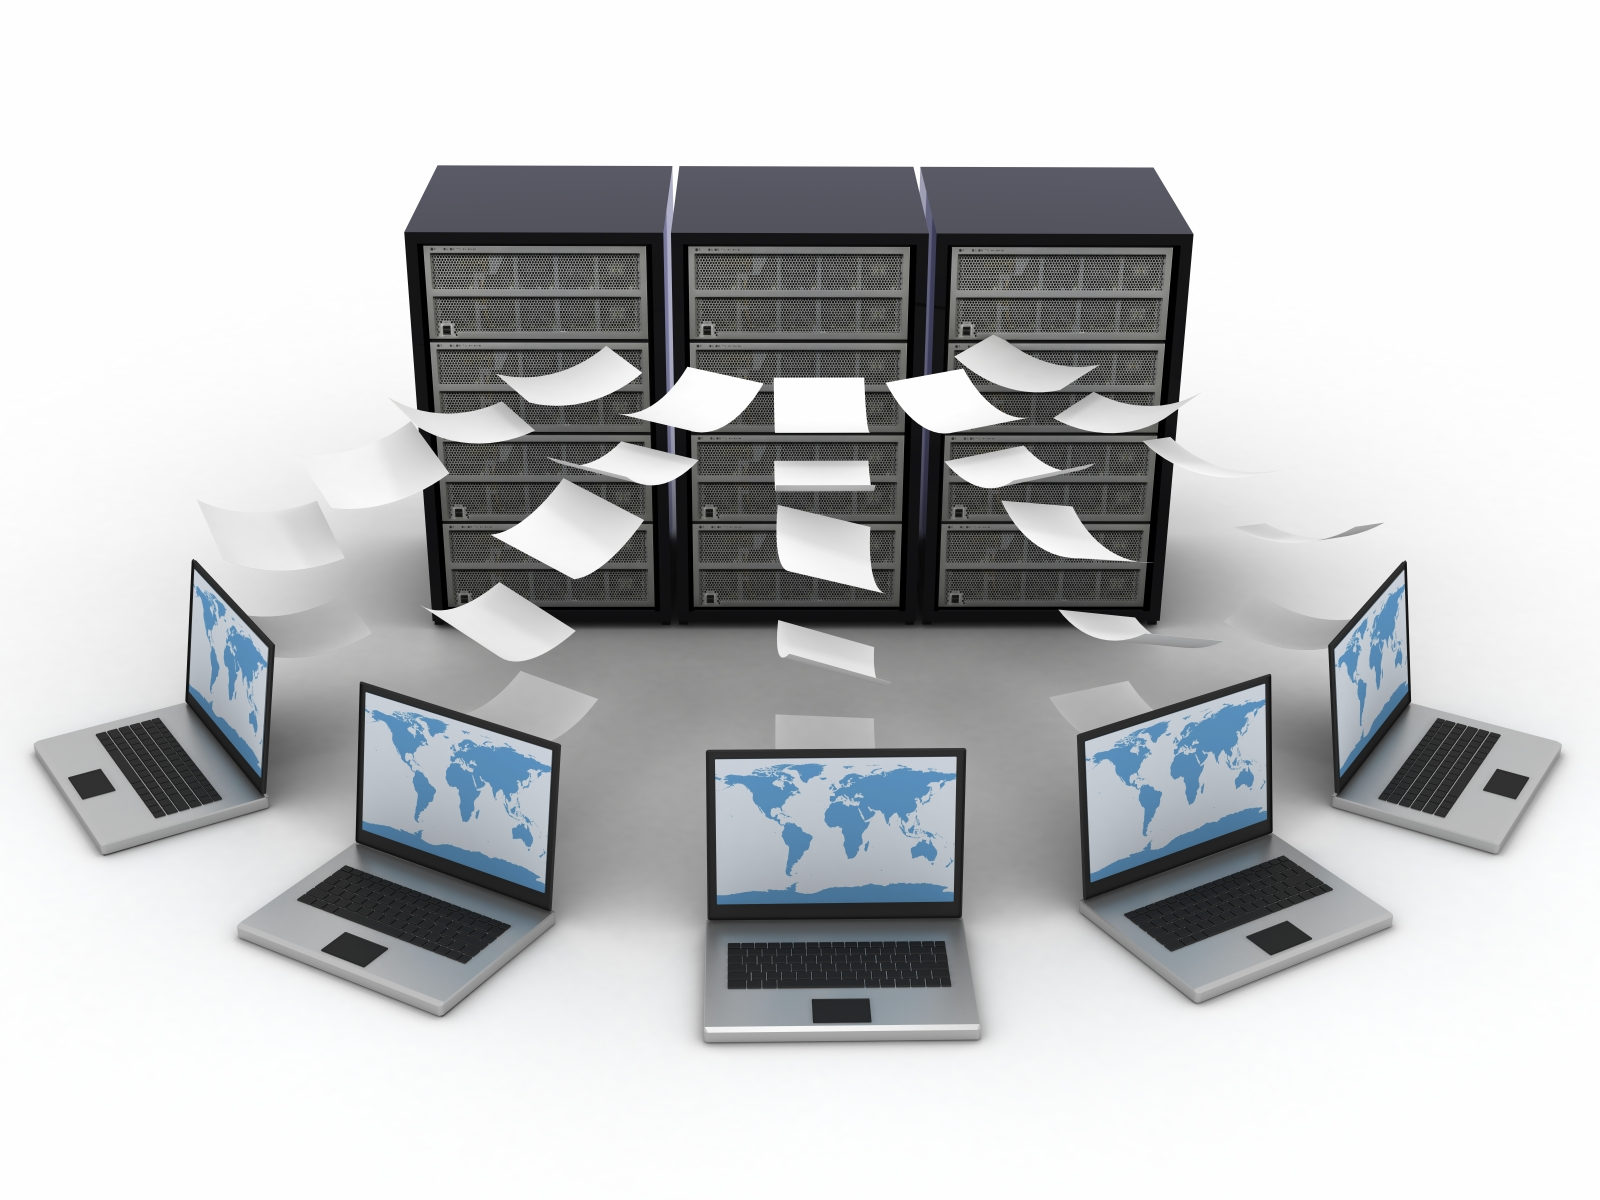 http://www.citna.ir/sites/default/files/backup.jpeg